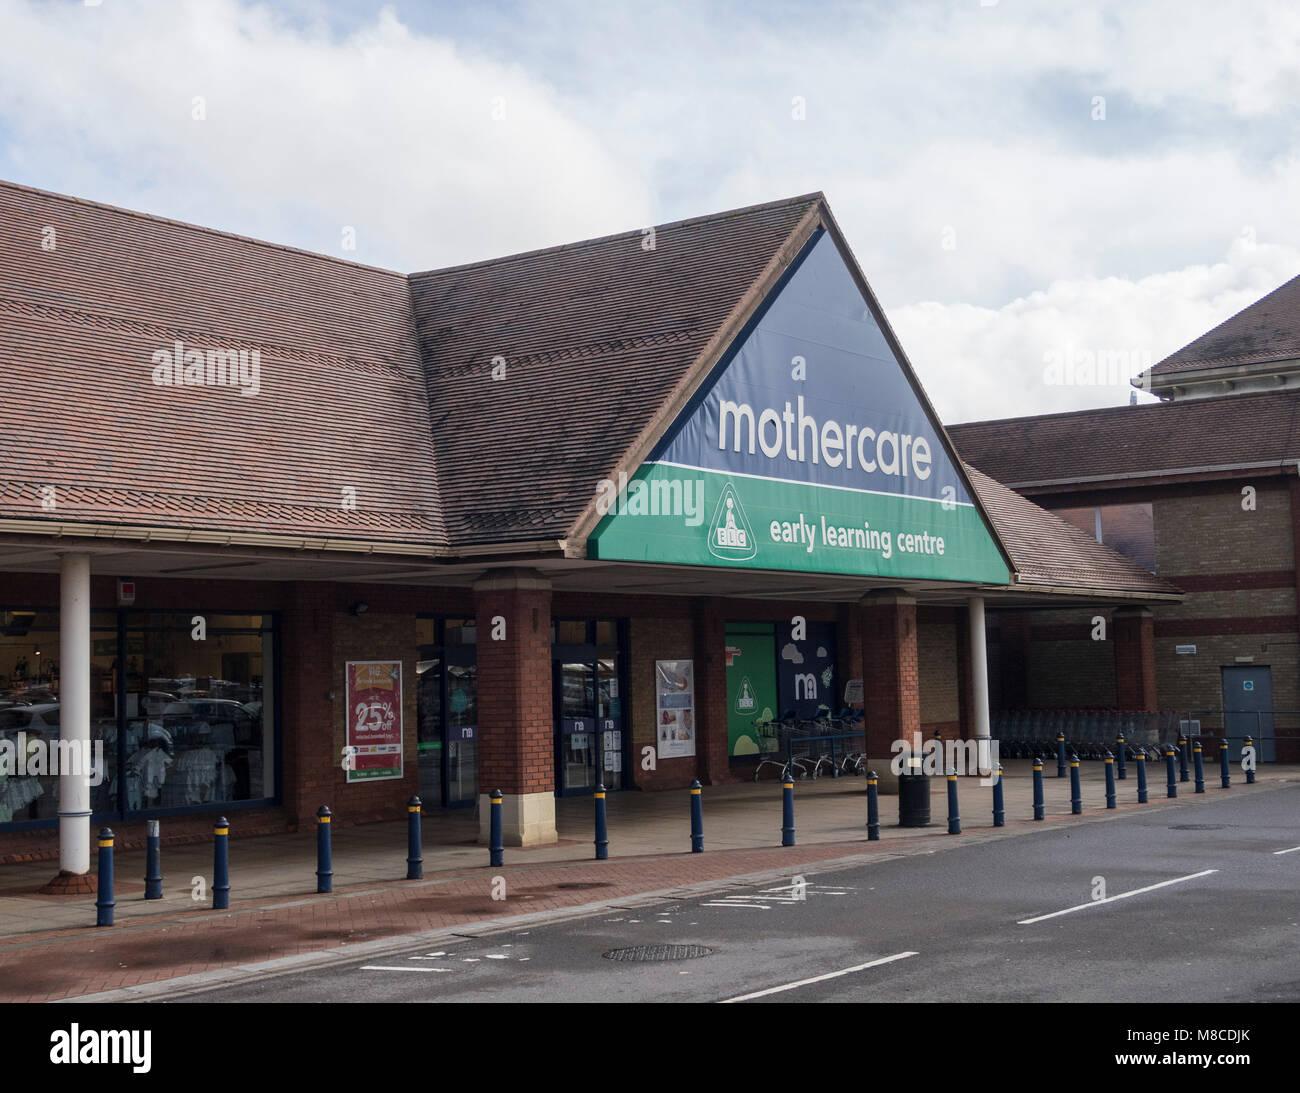 Mothercare store, Hankridge Farm retail park, Taunton, Somerset - Stock Image